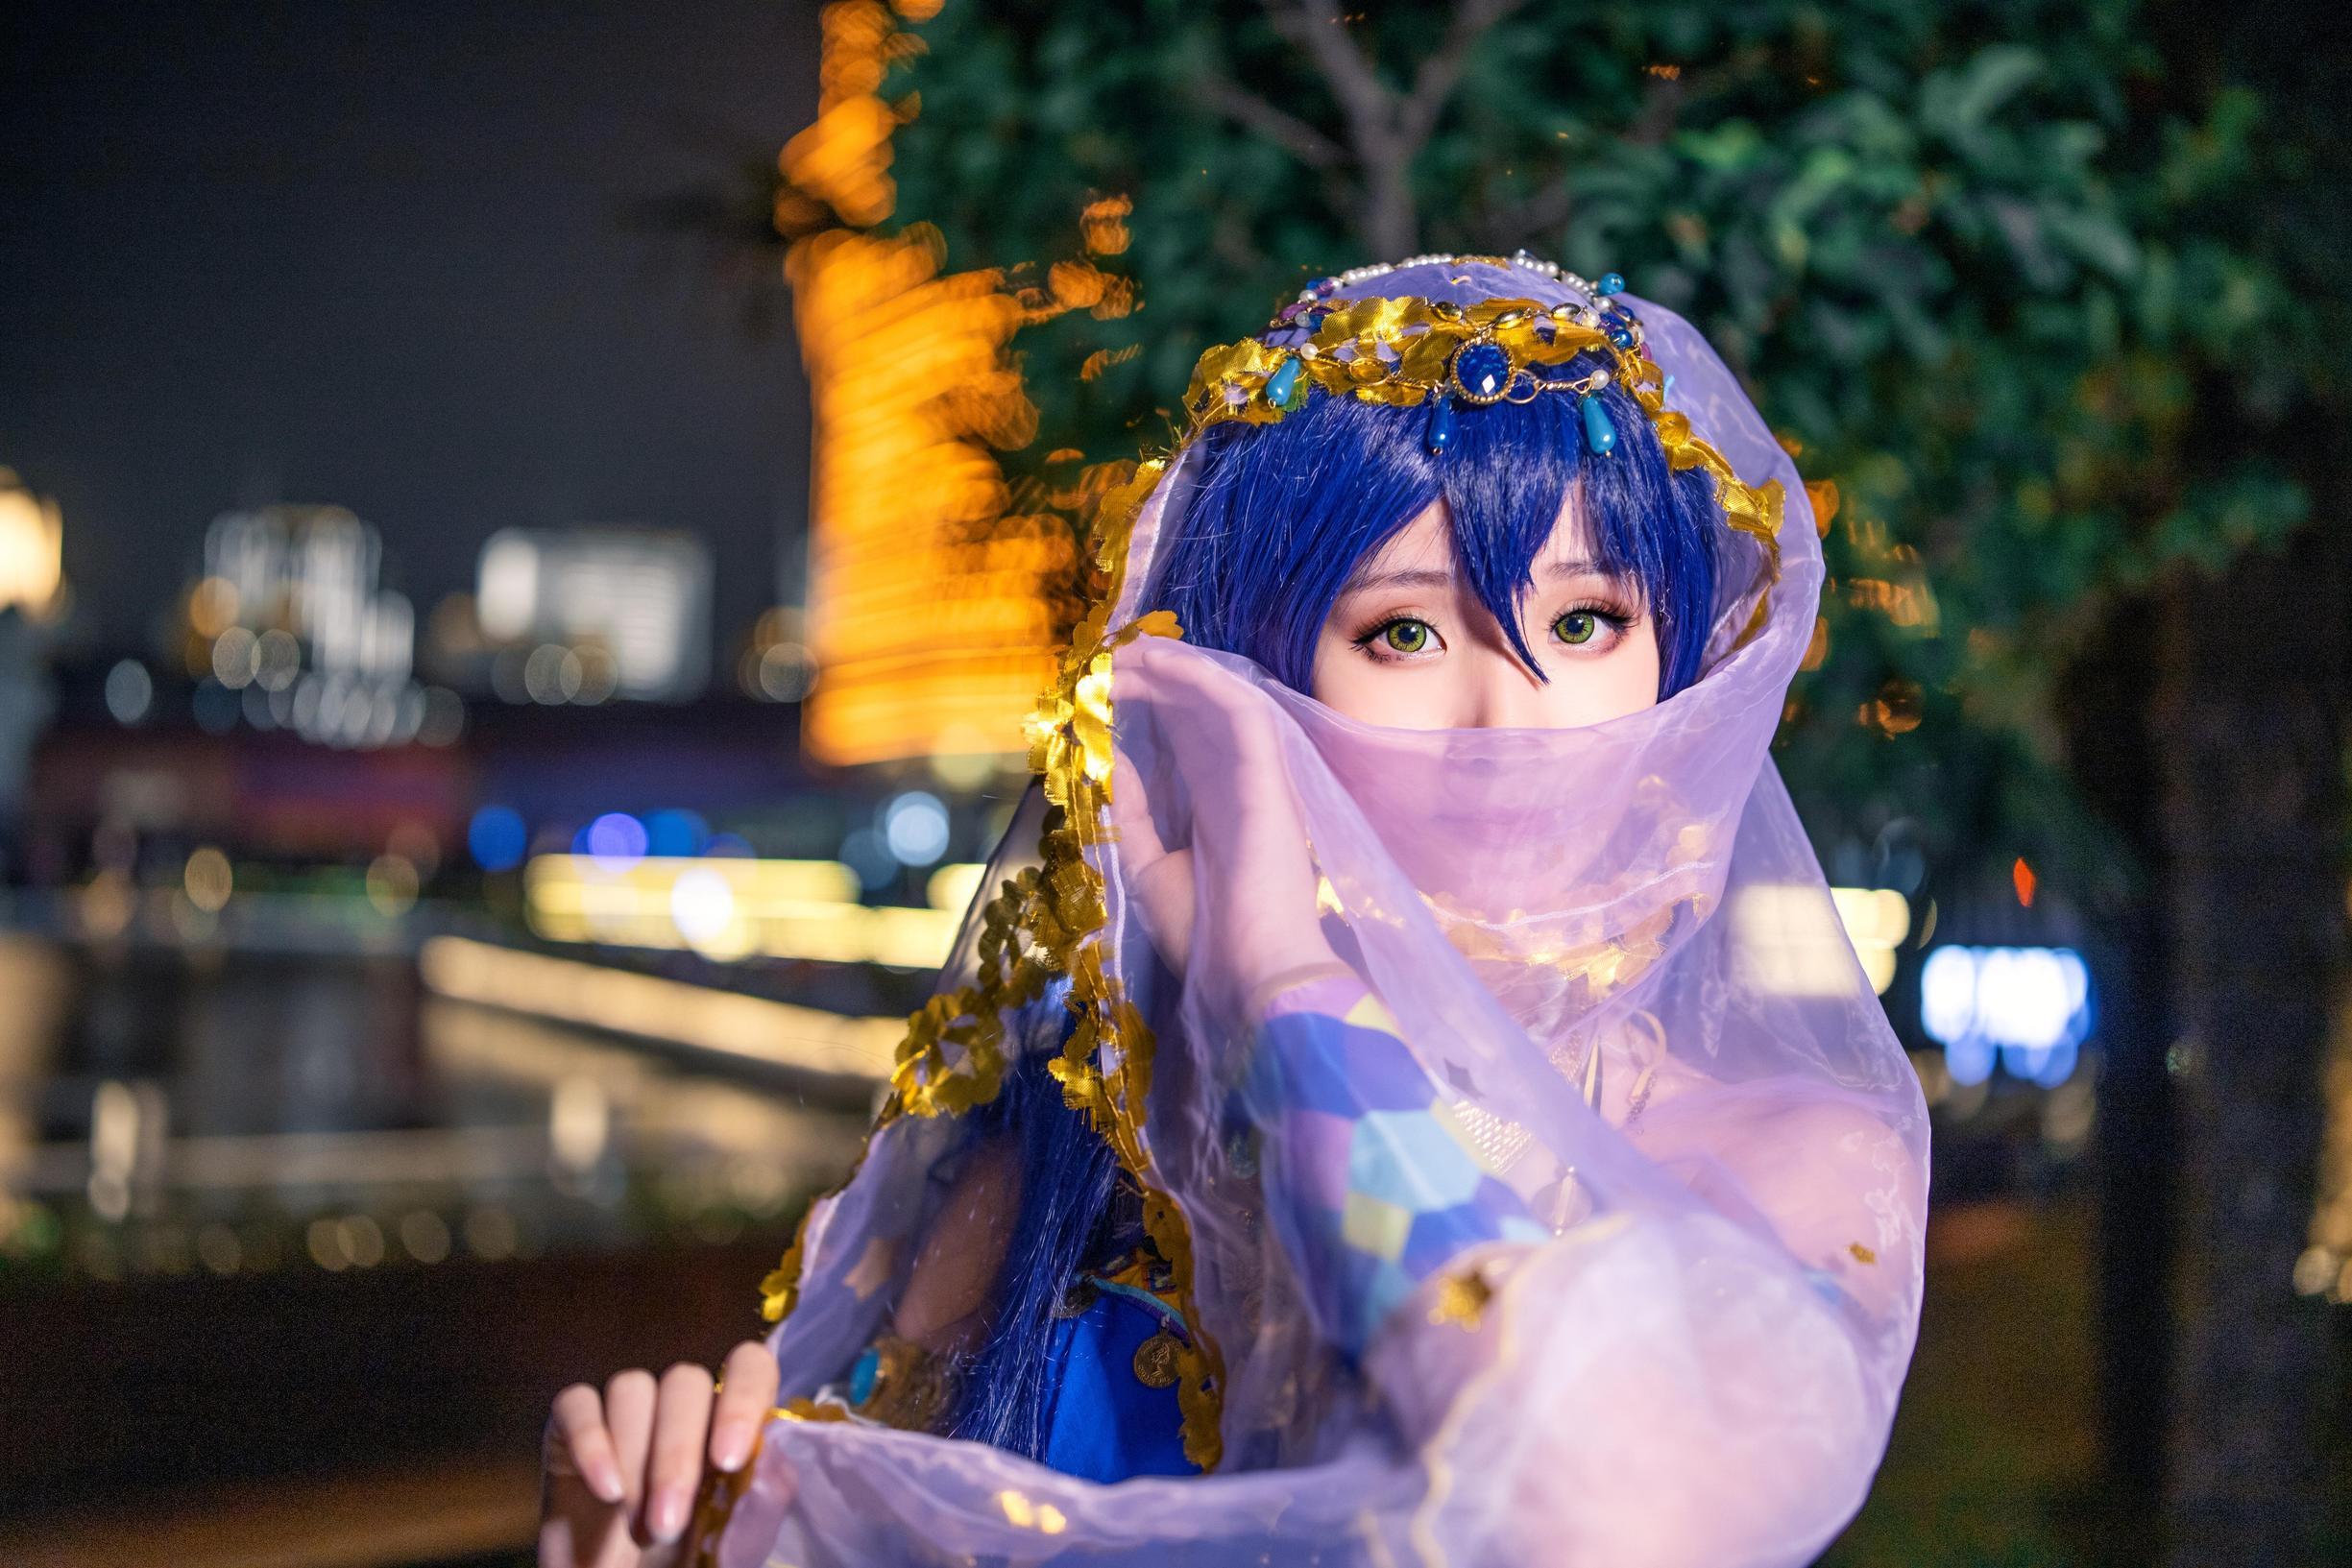 《LOVE LIVE!》舞娘cosplay【CN:白宇不是鱼】-第6张